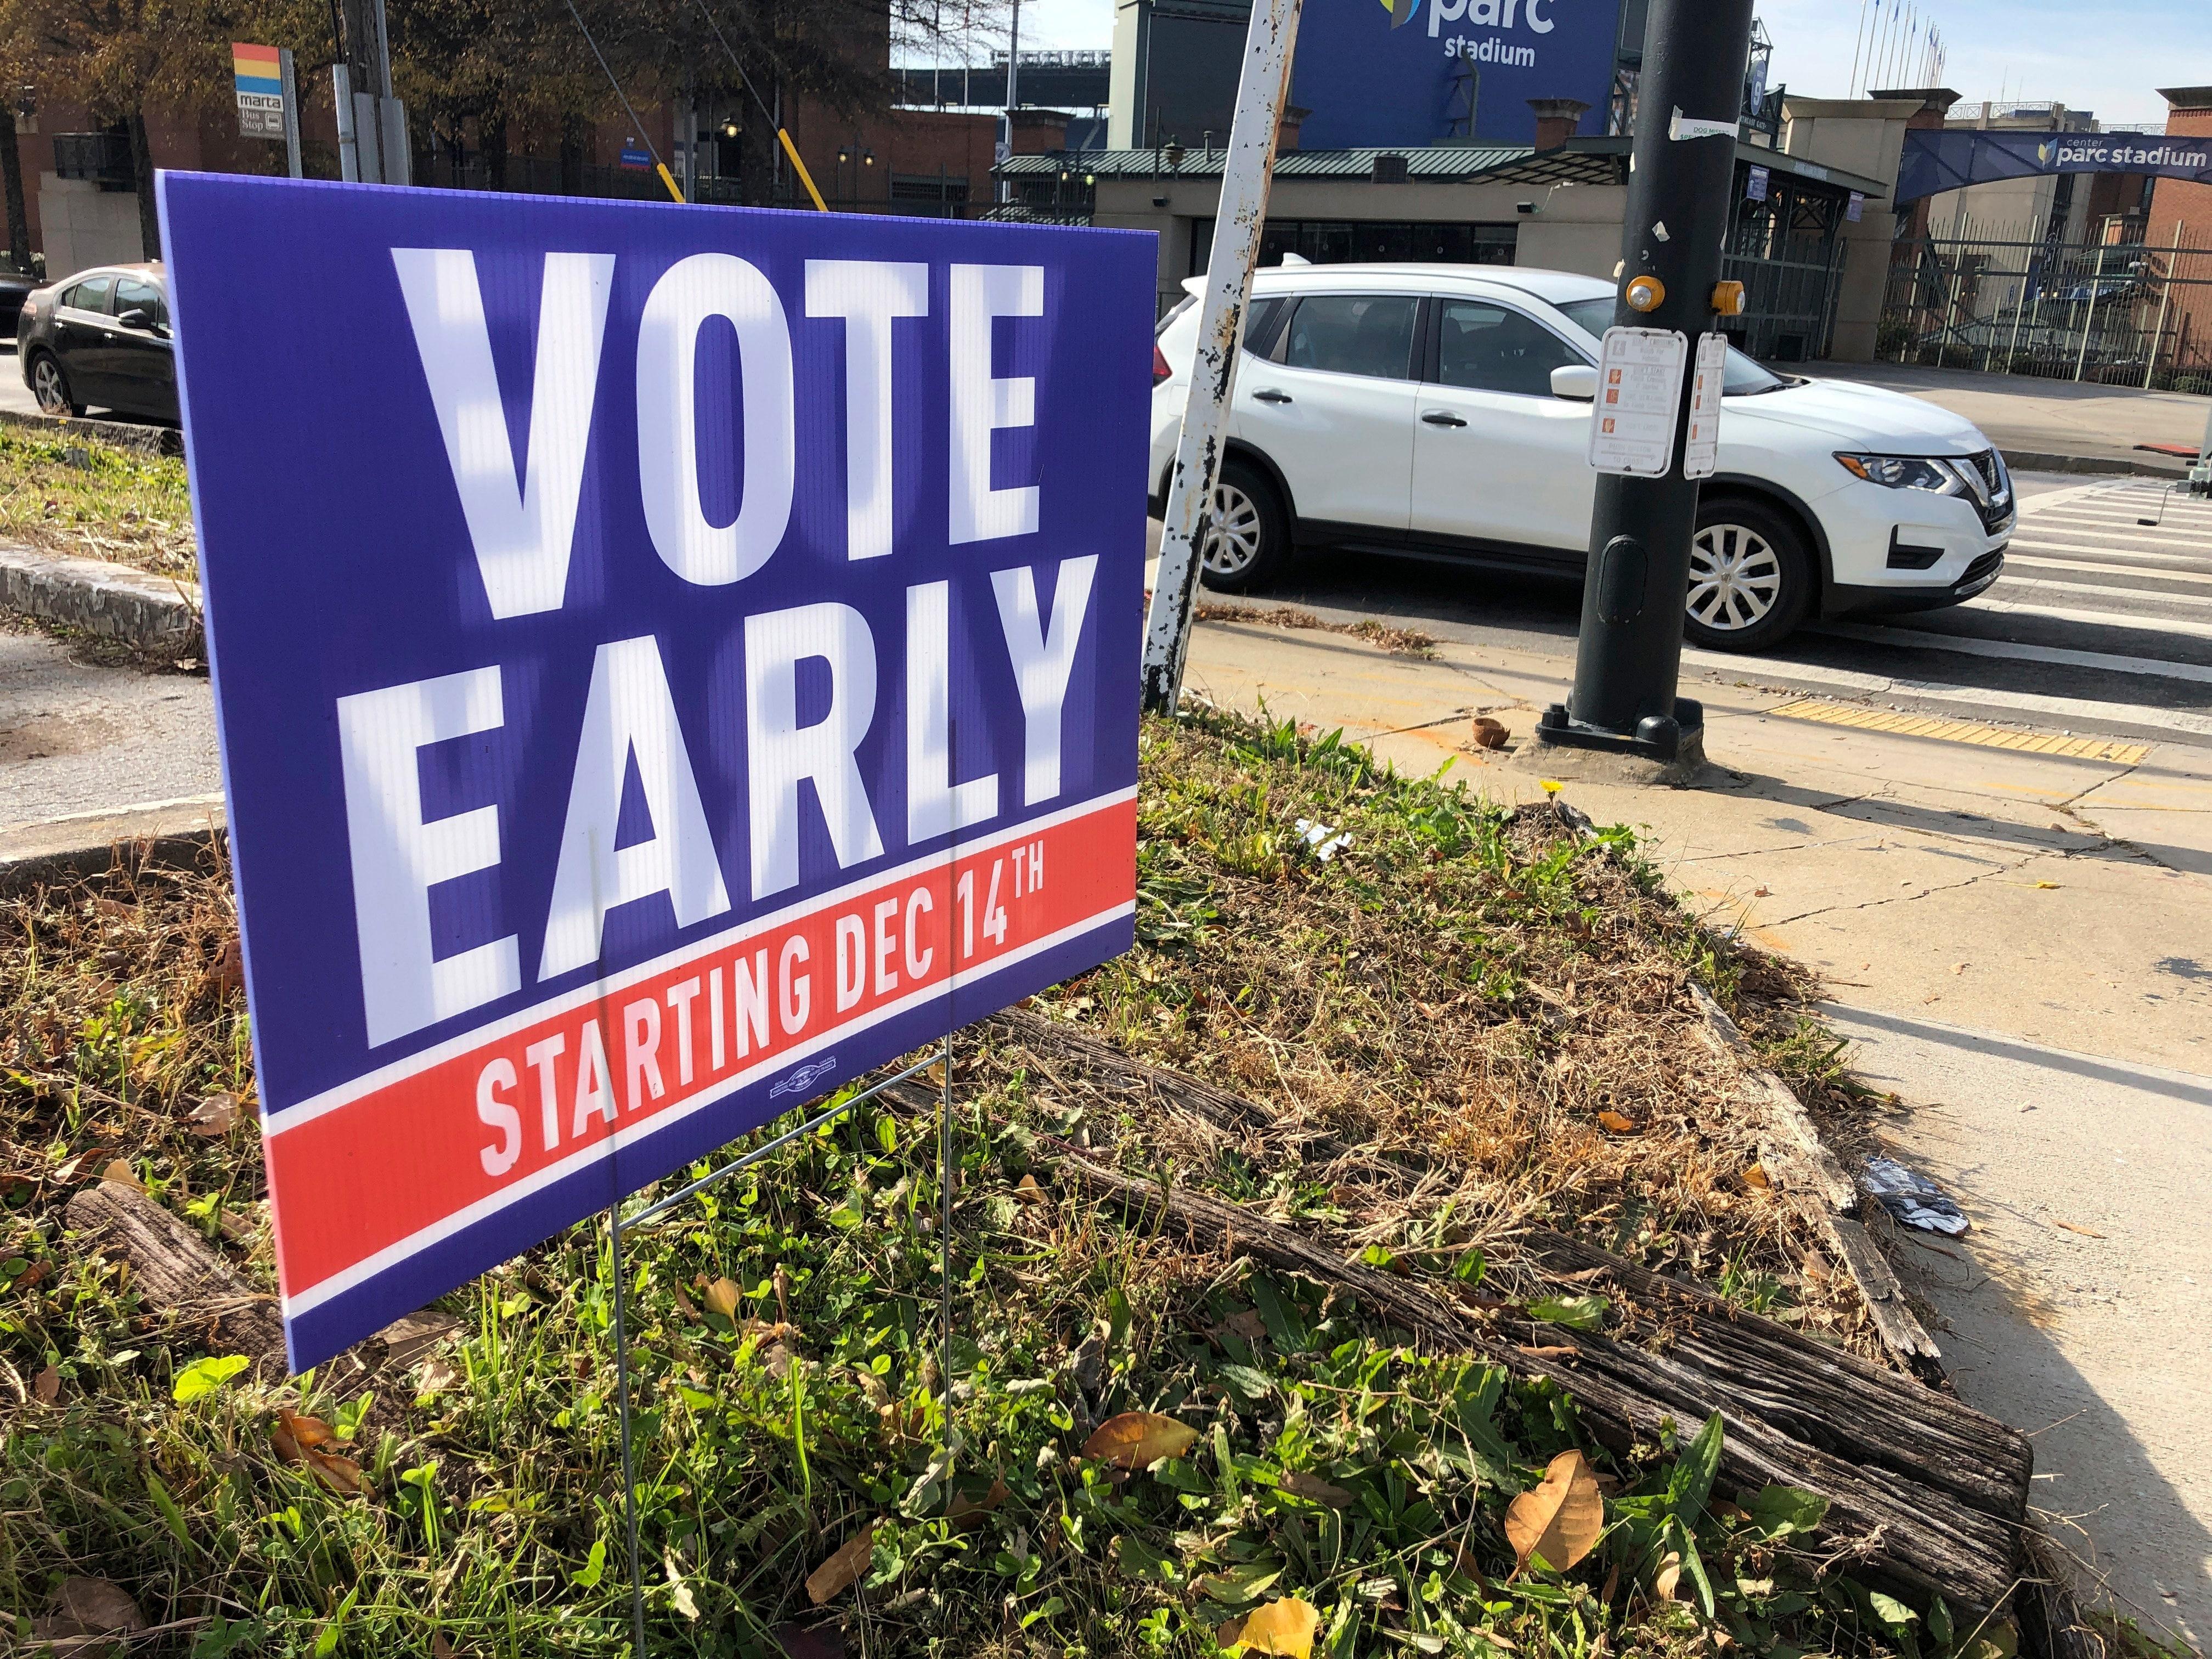 LIVE UPDATES: Georgia Senate runoffs see more than 1 million ballots already cast